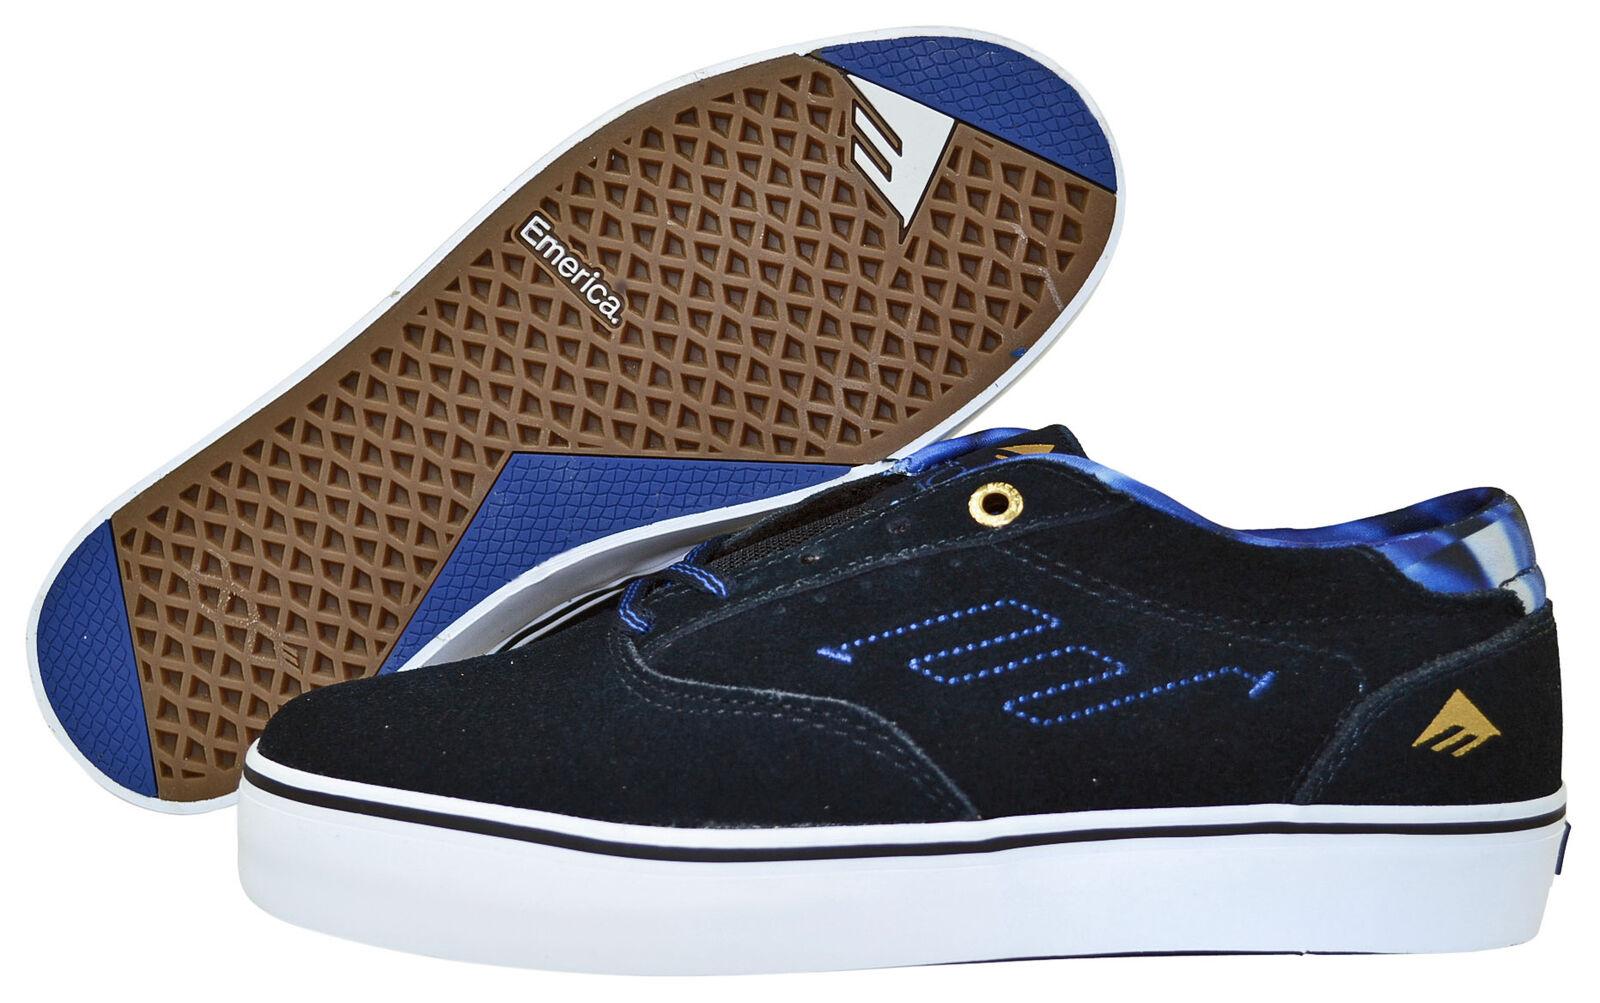 Emerica The Provost Skater Schuhe/Sneaker navy Größenauswahl